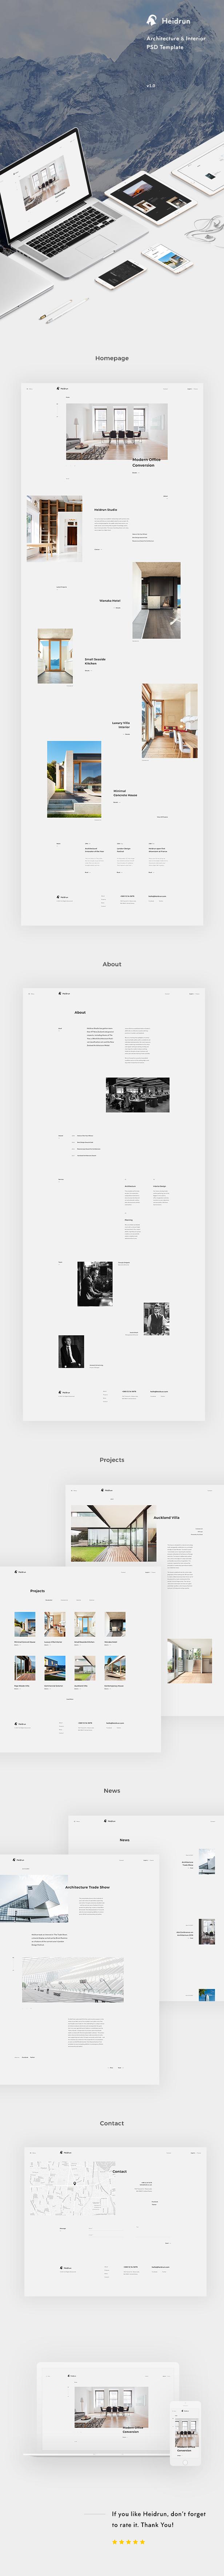 Heidrun - Architecture & Interior PSD Template - 1